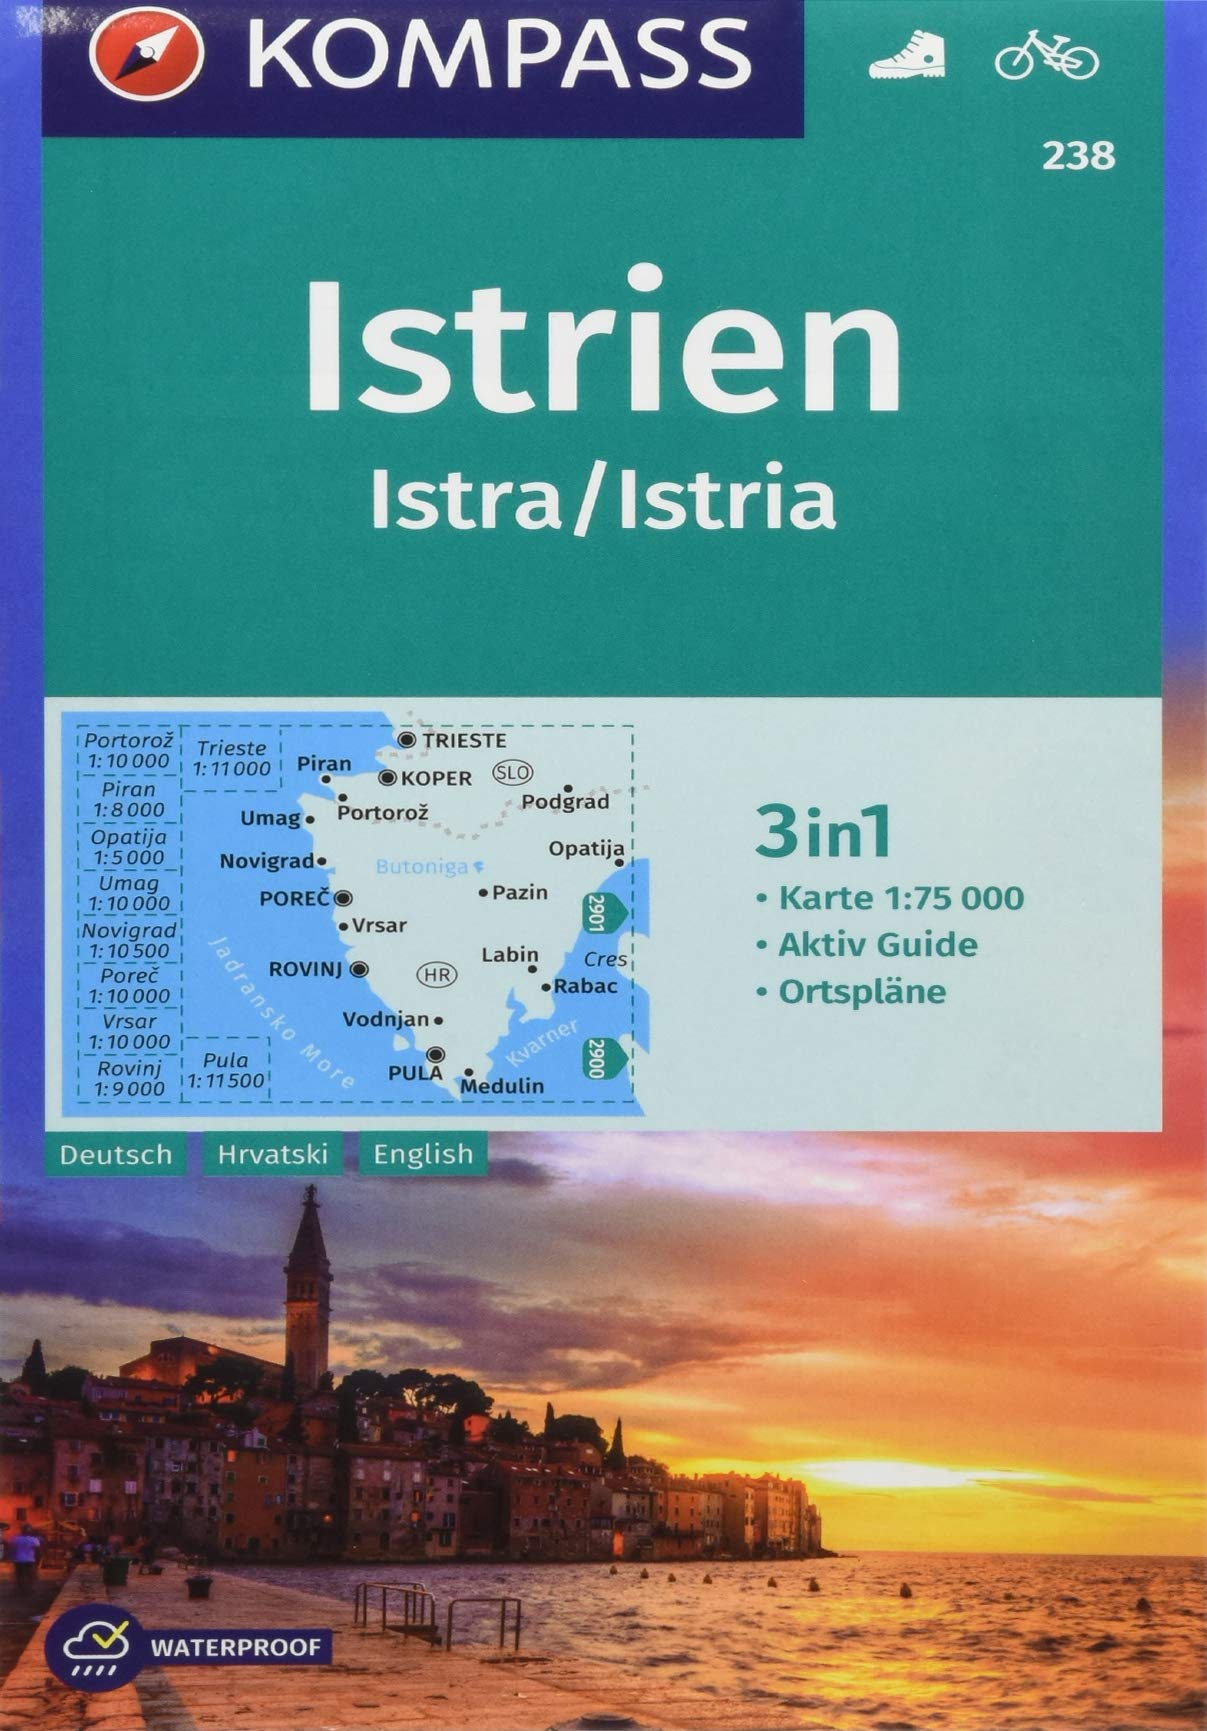 KOMPASS Wanderkarte Istrien Istra Istria  3in1 Wanderkarte 1 75000 Mit Aktiv Guide Und Ortsplänen. Fahrradfahren.  KOMPASS Wanderkarten Band 238